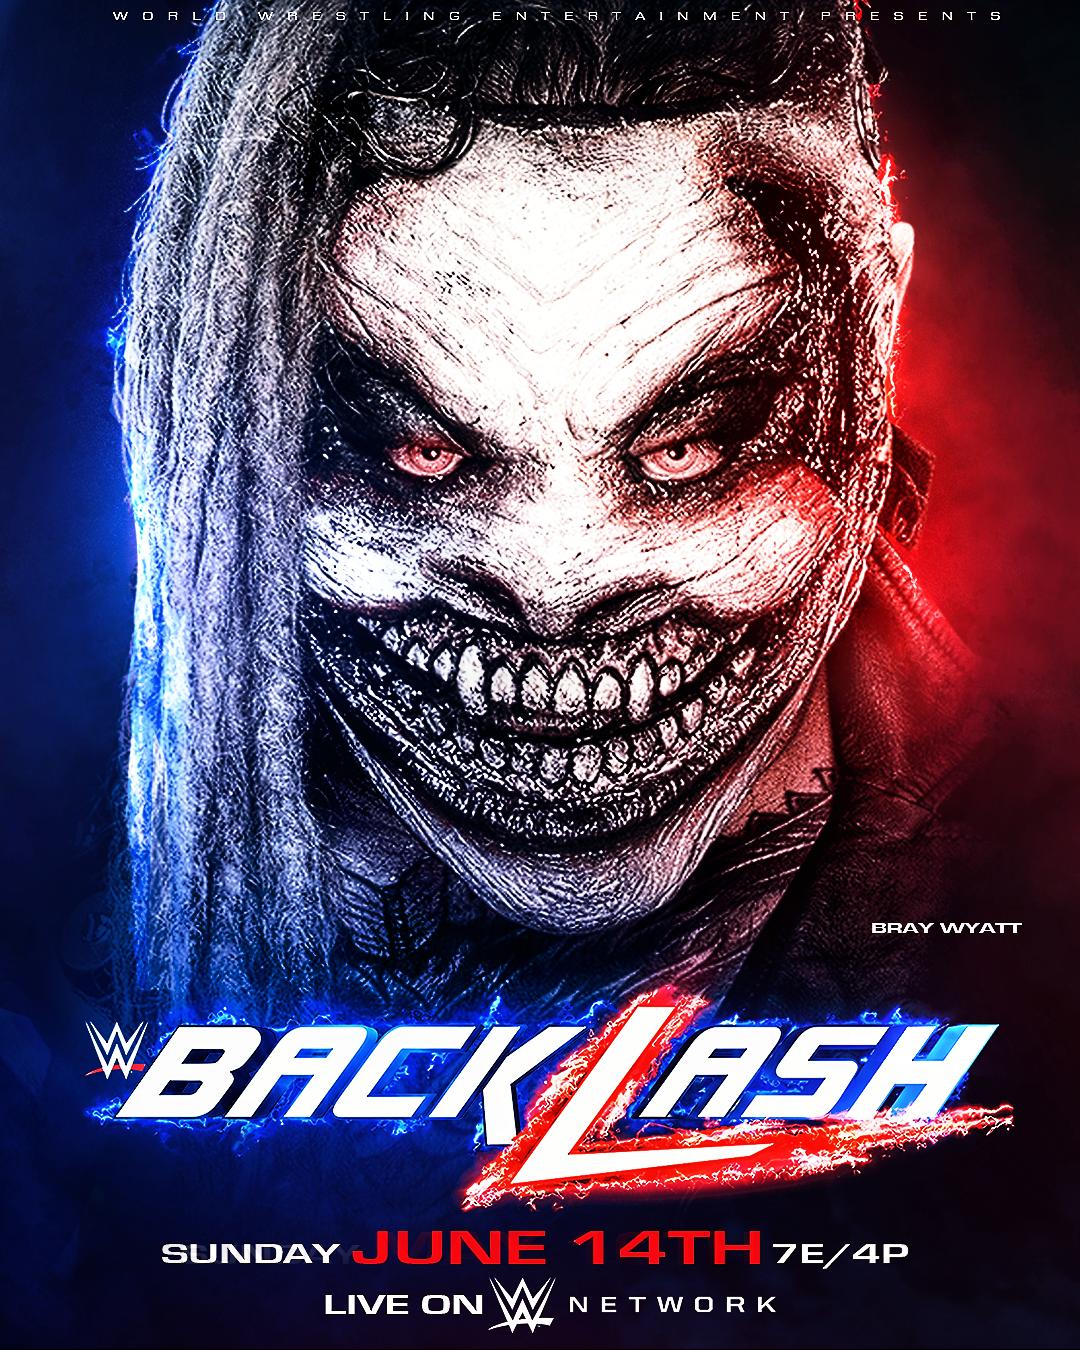 WWE Backlash 2020 poster